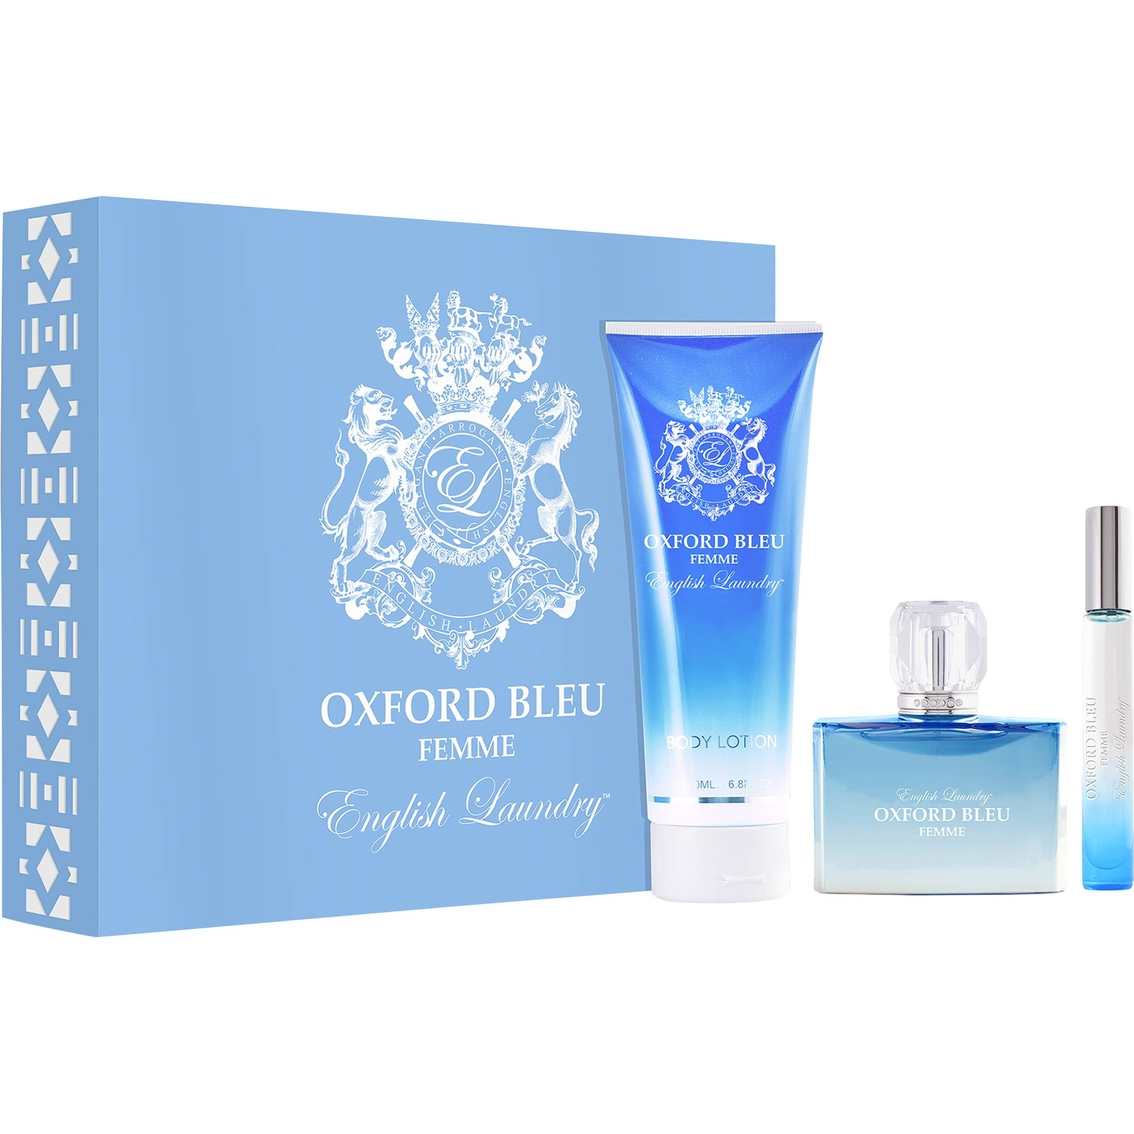 English laundry oxford bleu femme eau de parfum gift set for English laundry perfume